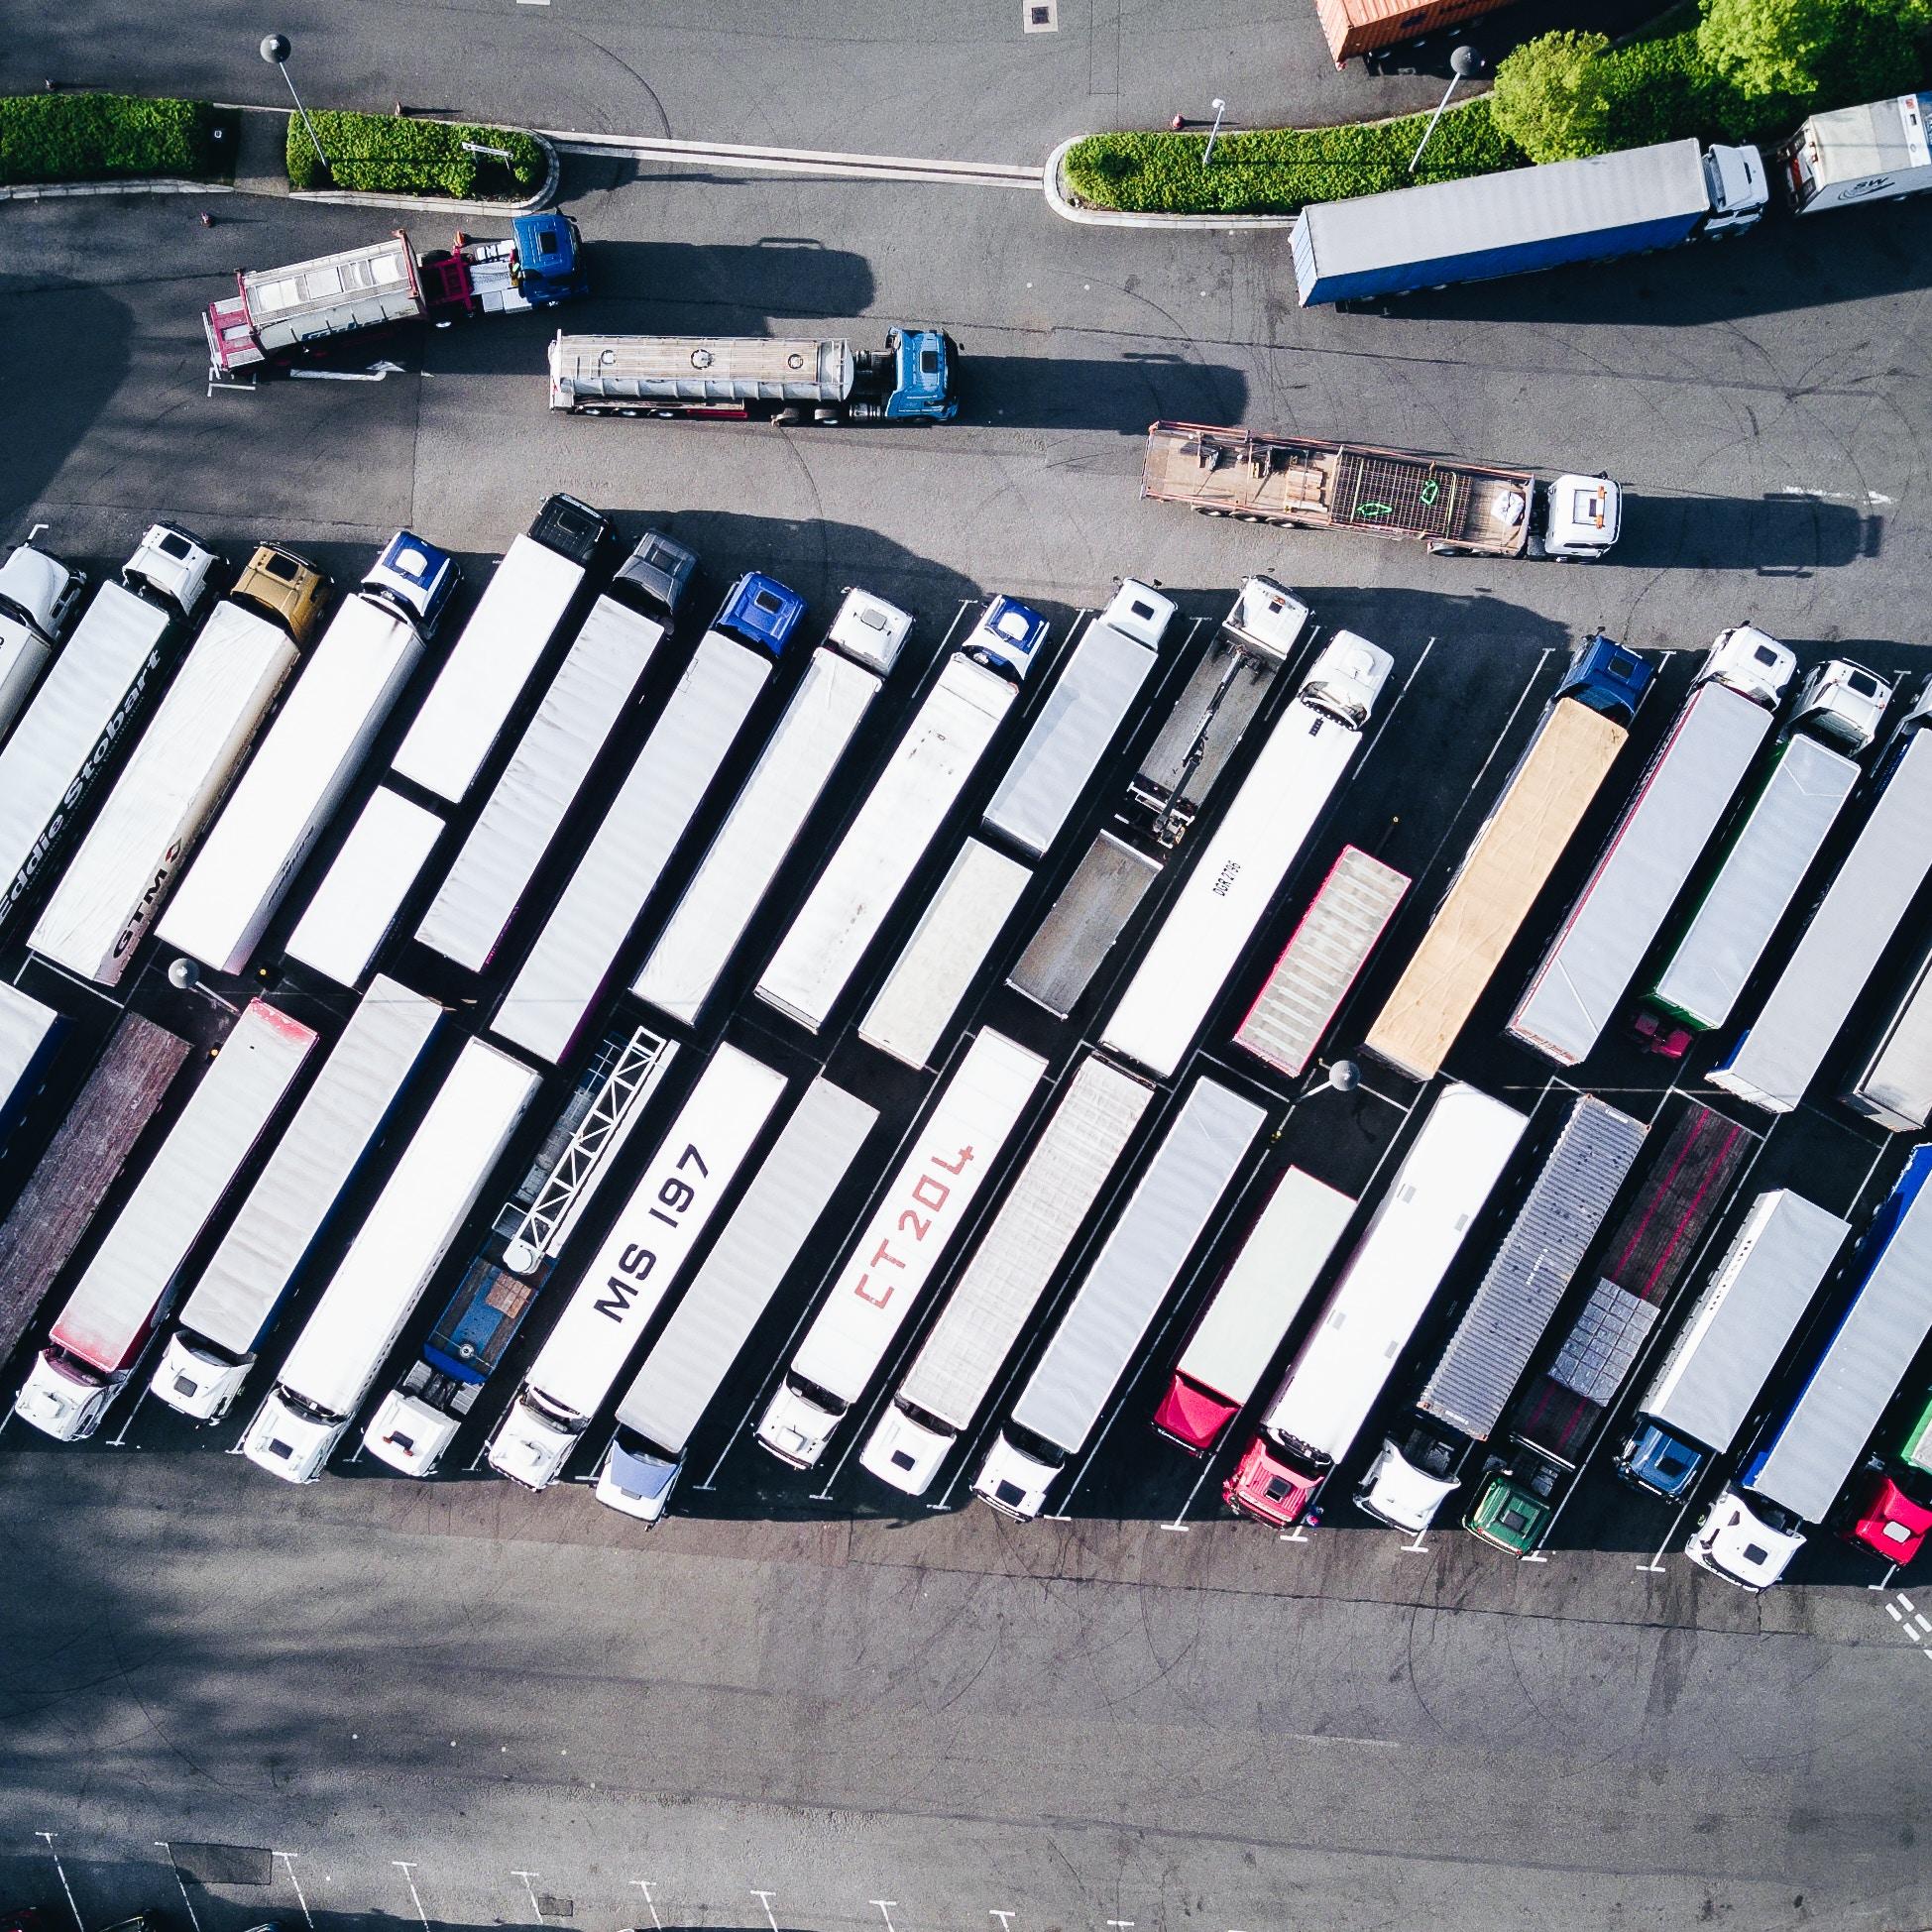 trucks-in-line